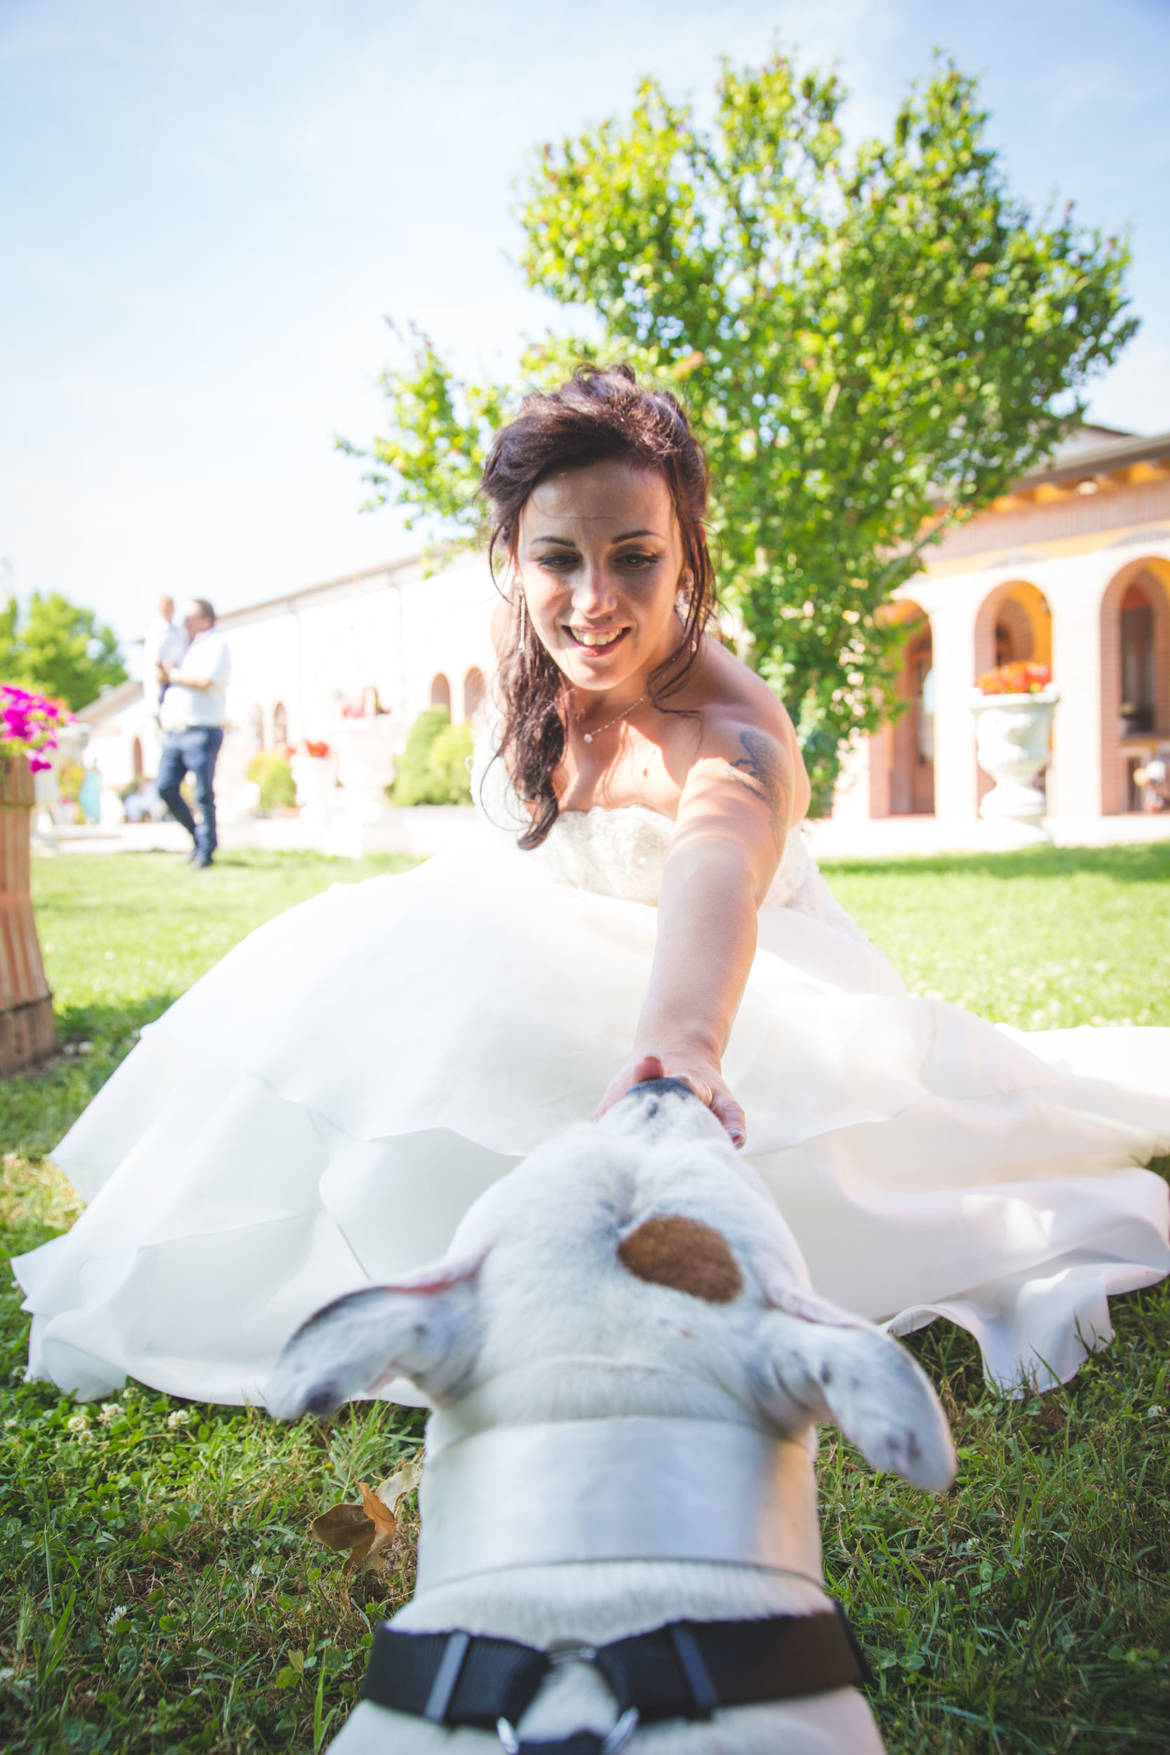 Matrimonio-Nadia-e-Tano-185.jpg